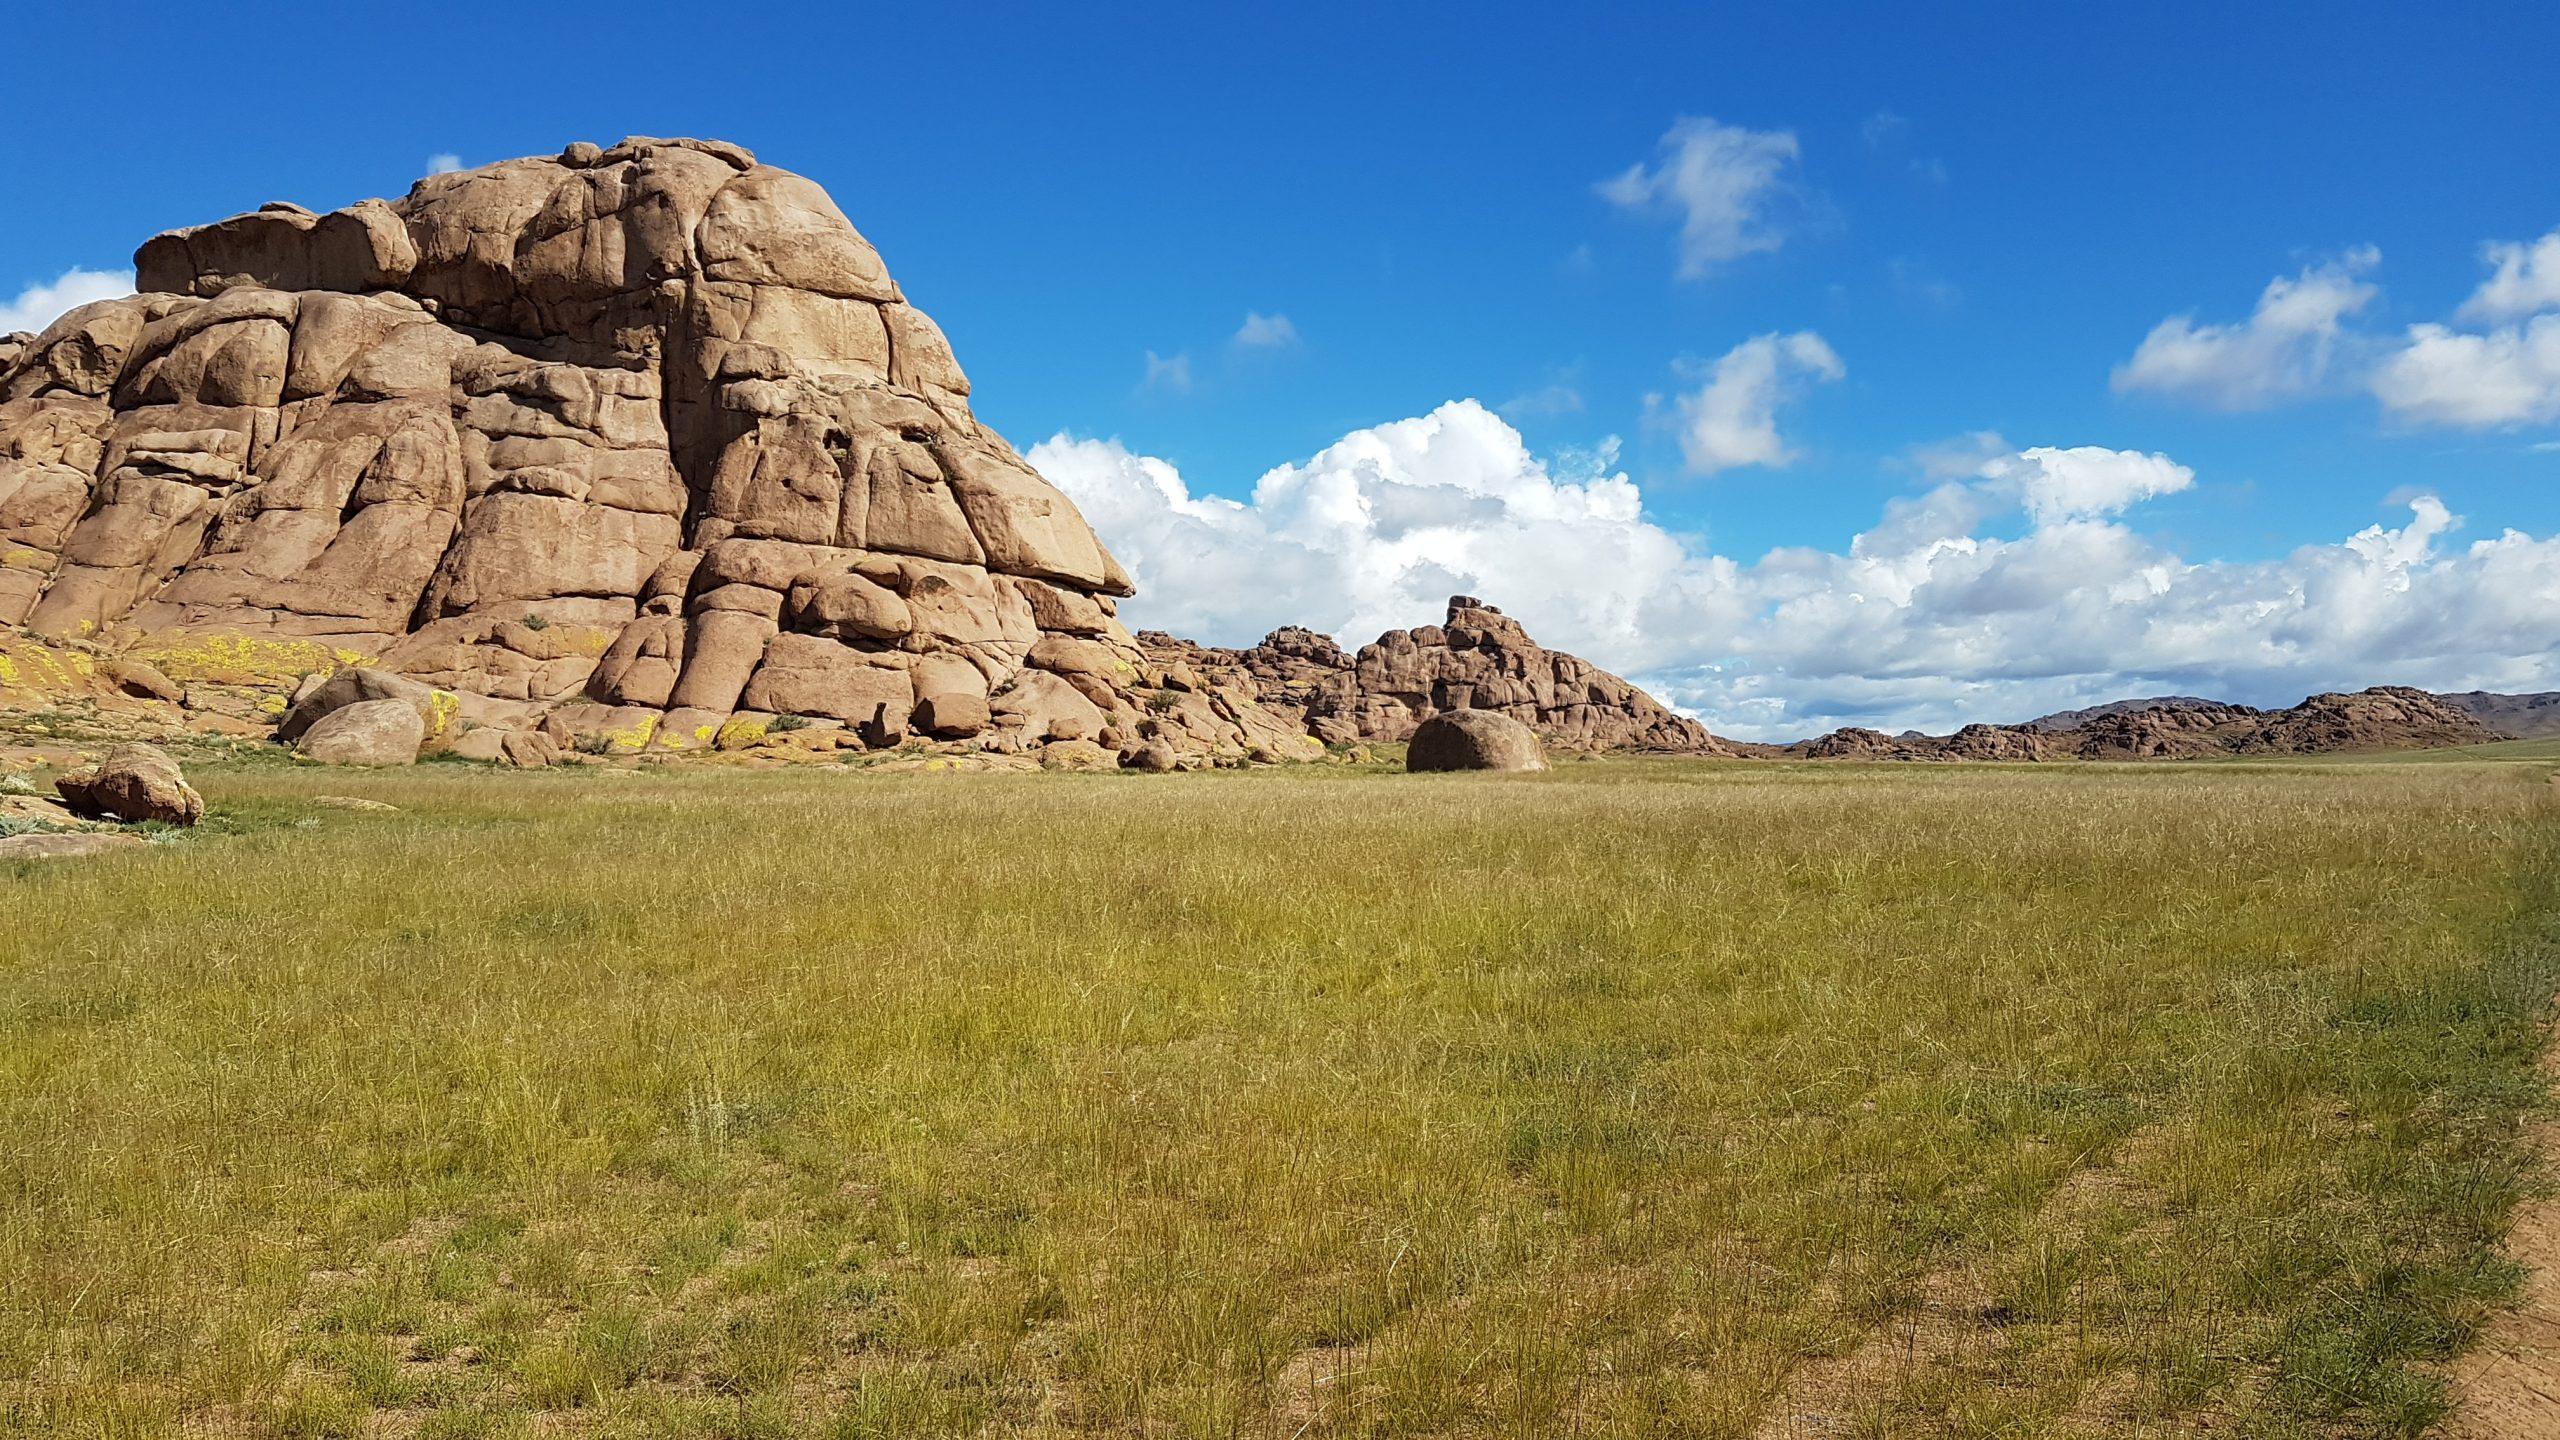 15 août : En direction d'Ulaangom